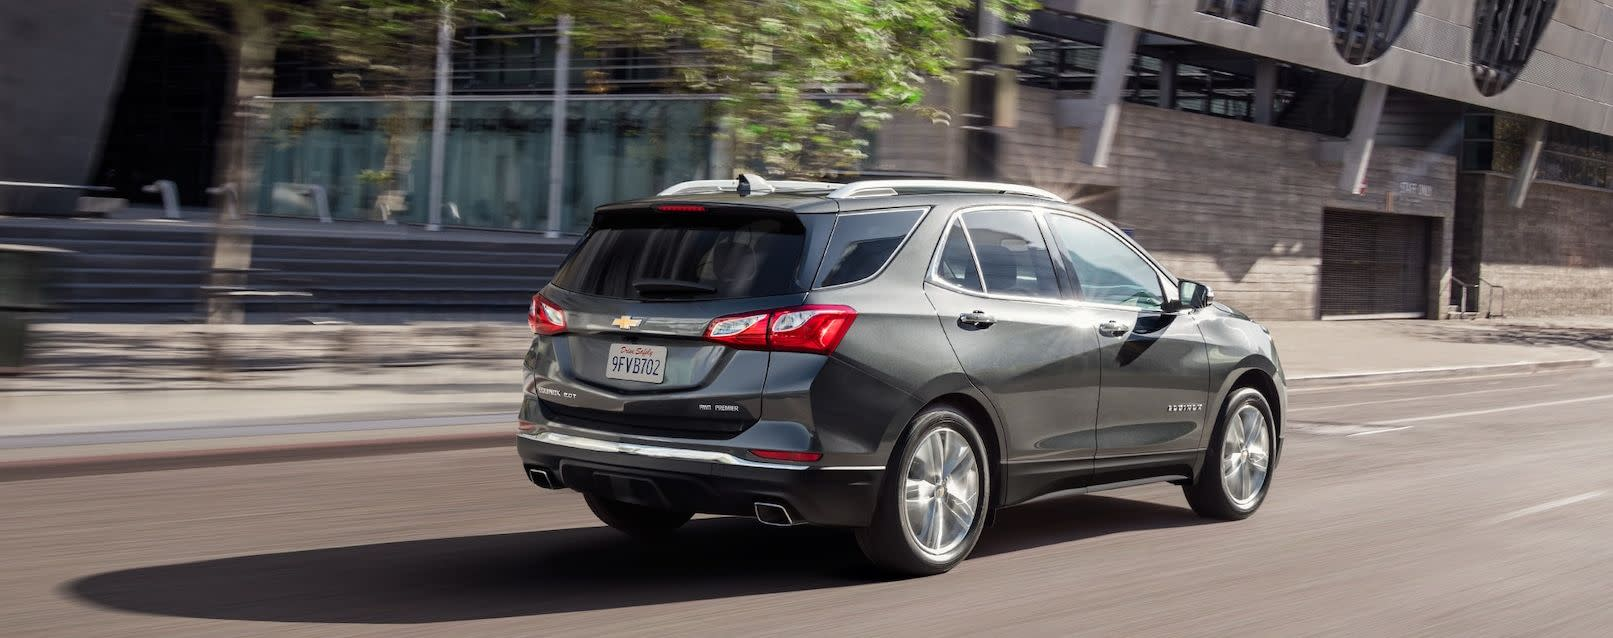 2020 Chevrolet Equinox for Sale near Southfield, MI